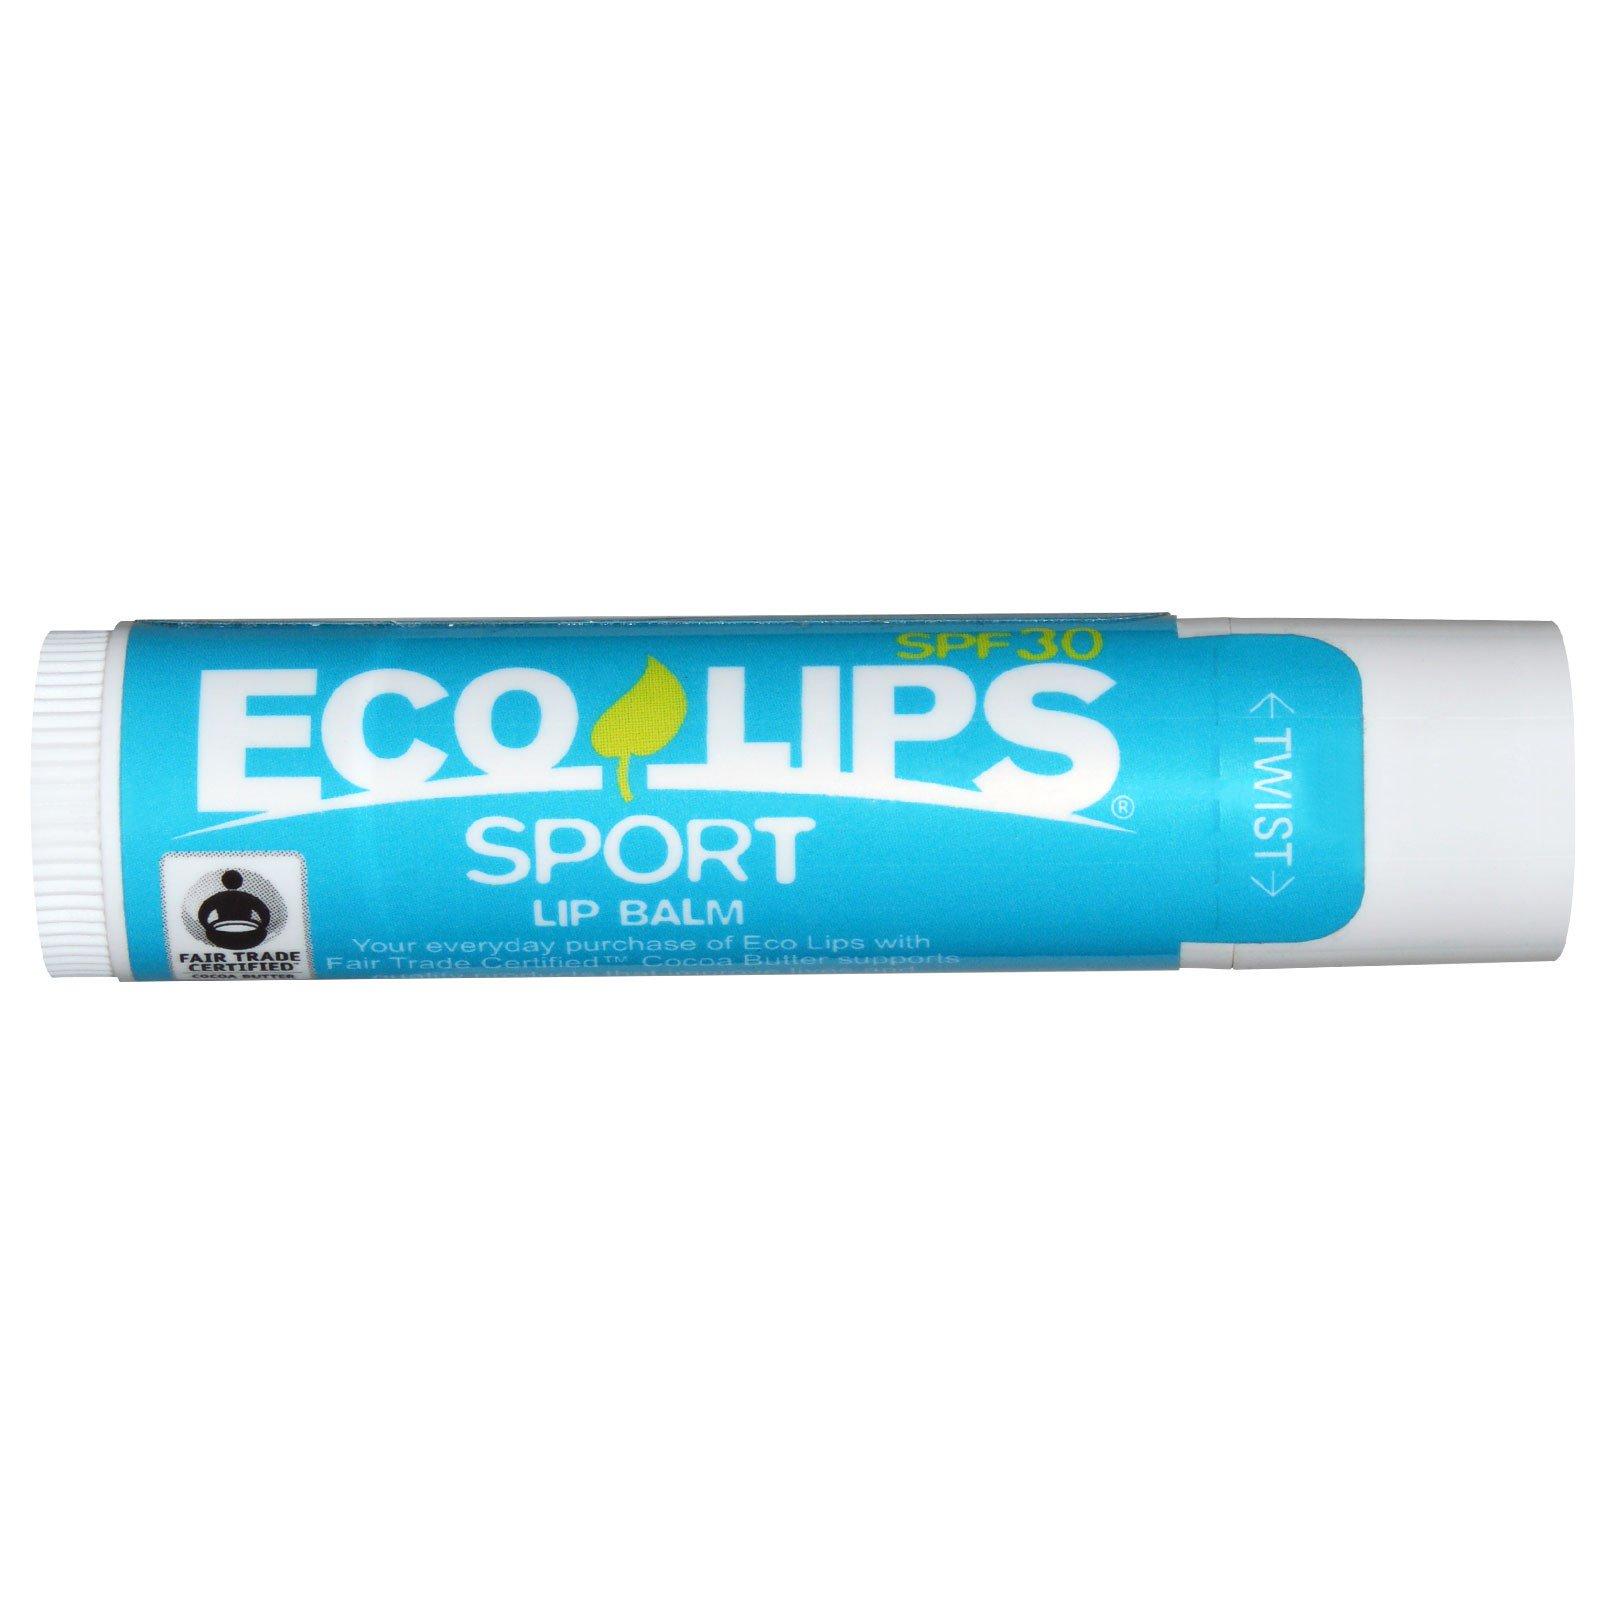 Eco Lips - Sport Lip Balm Vanilla 30 SPF - 0.15 oz. (6 Pack) ITS SKIN Macaron Lip Balm #04 Pineapple